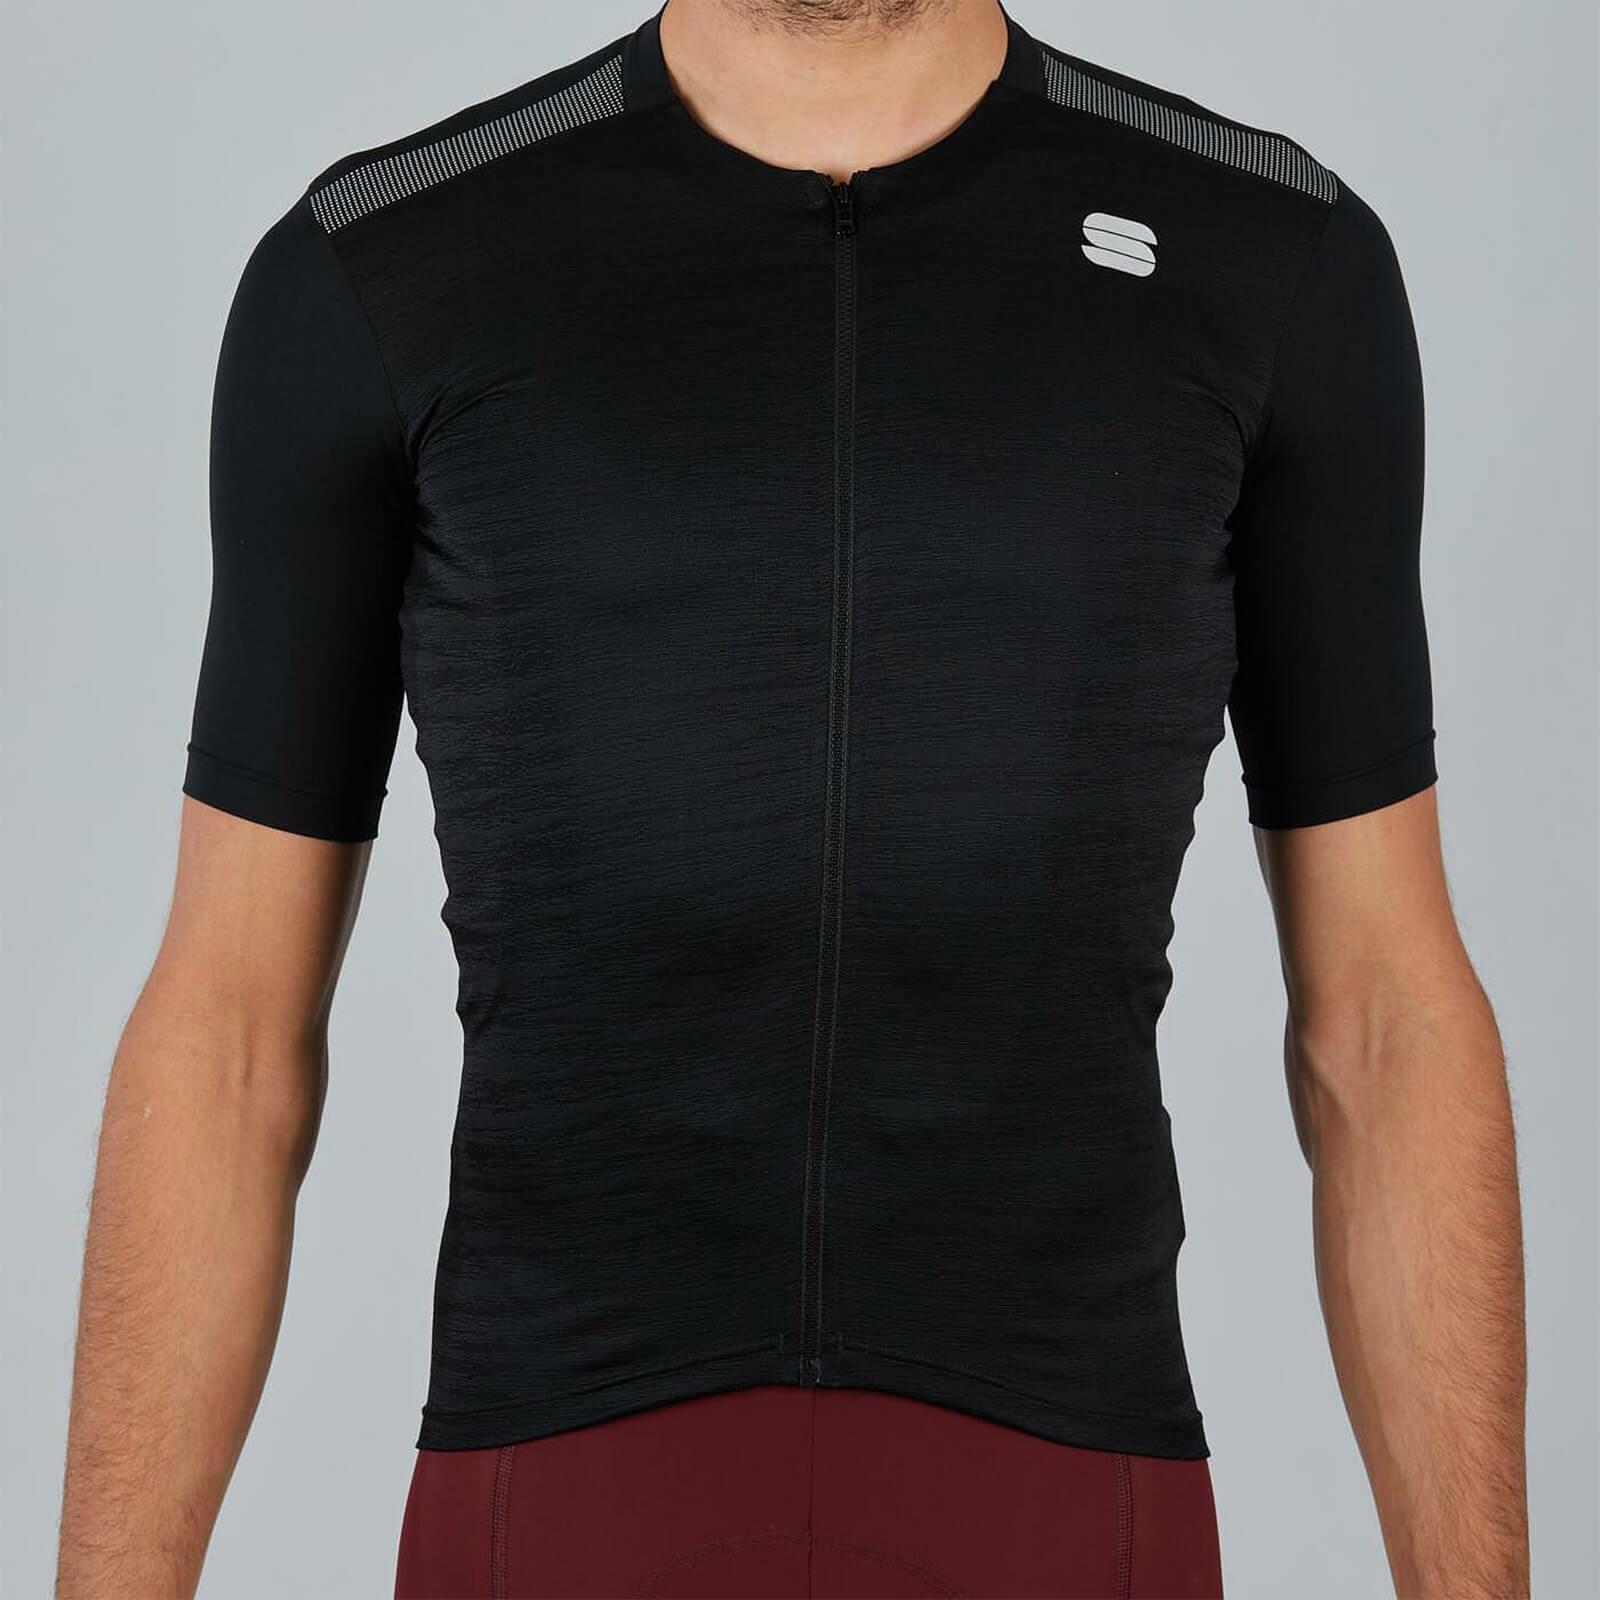 Sportful Supergiara Jersey - L - Black